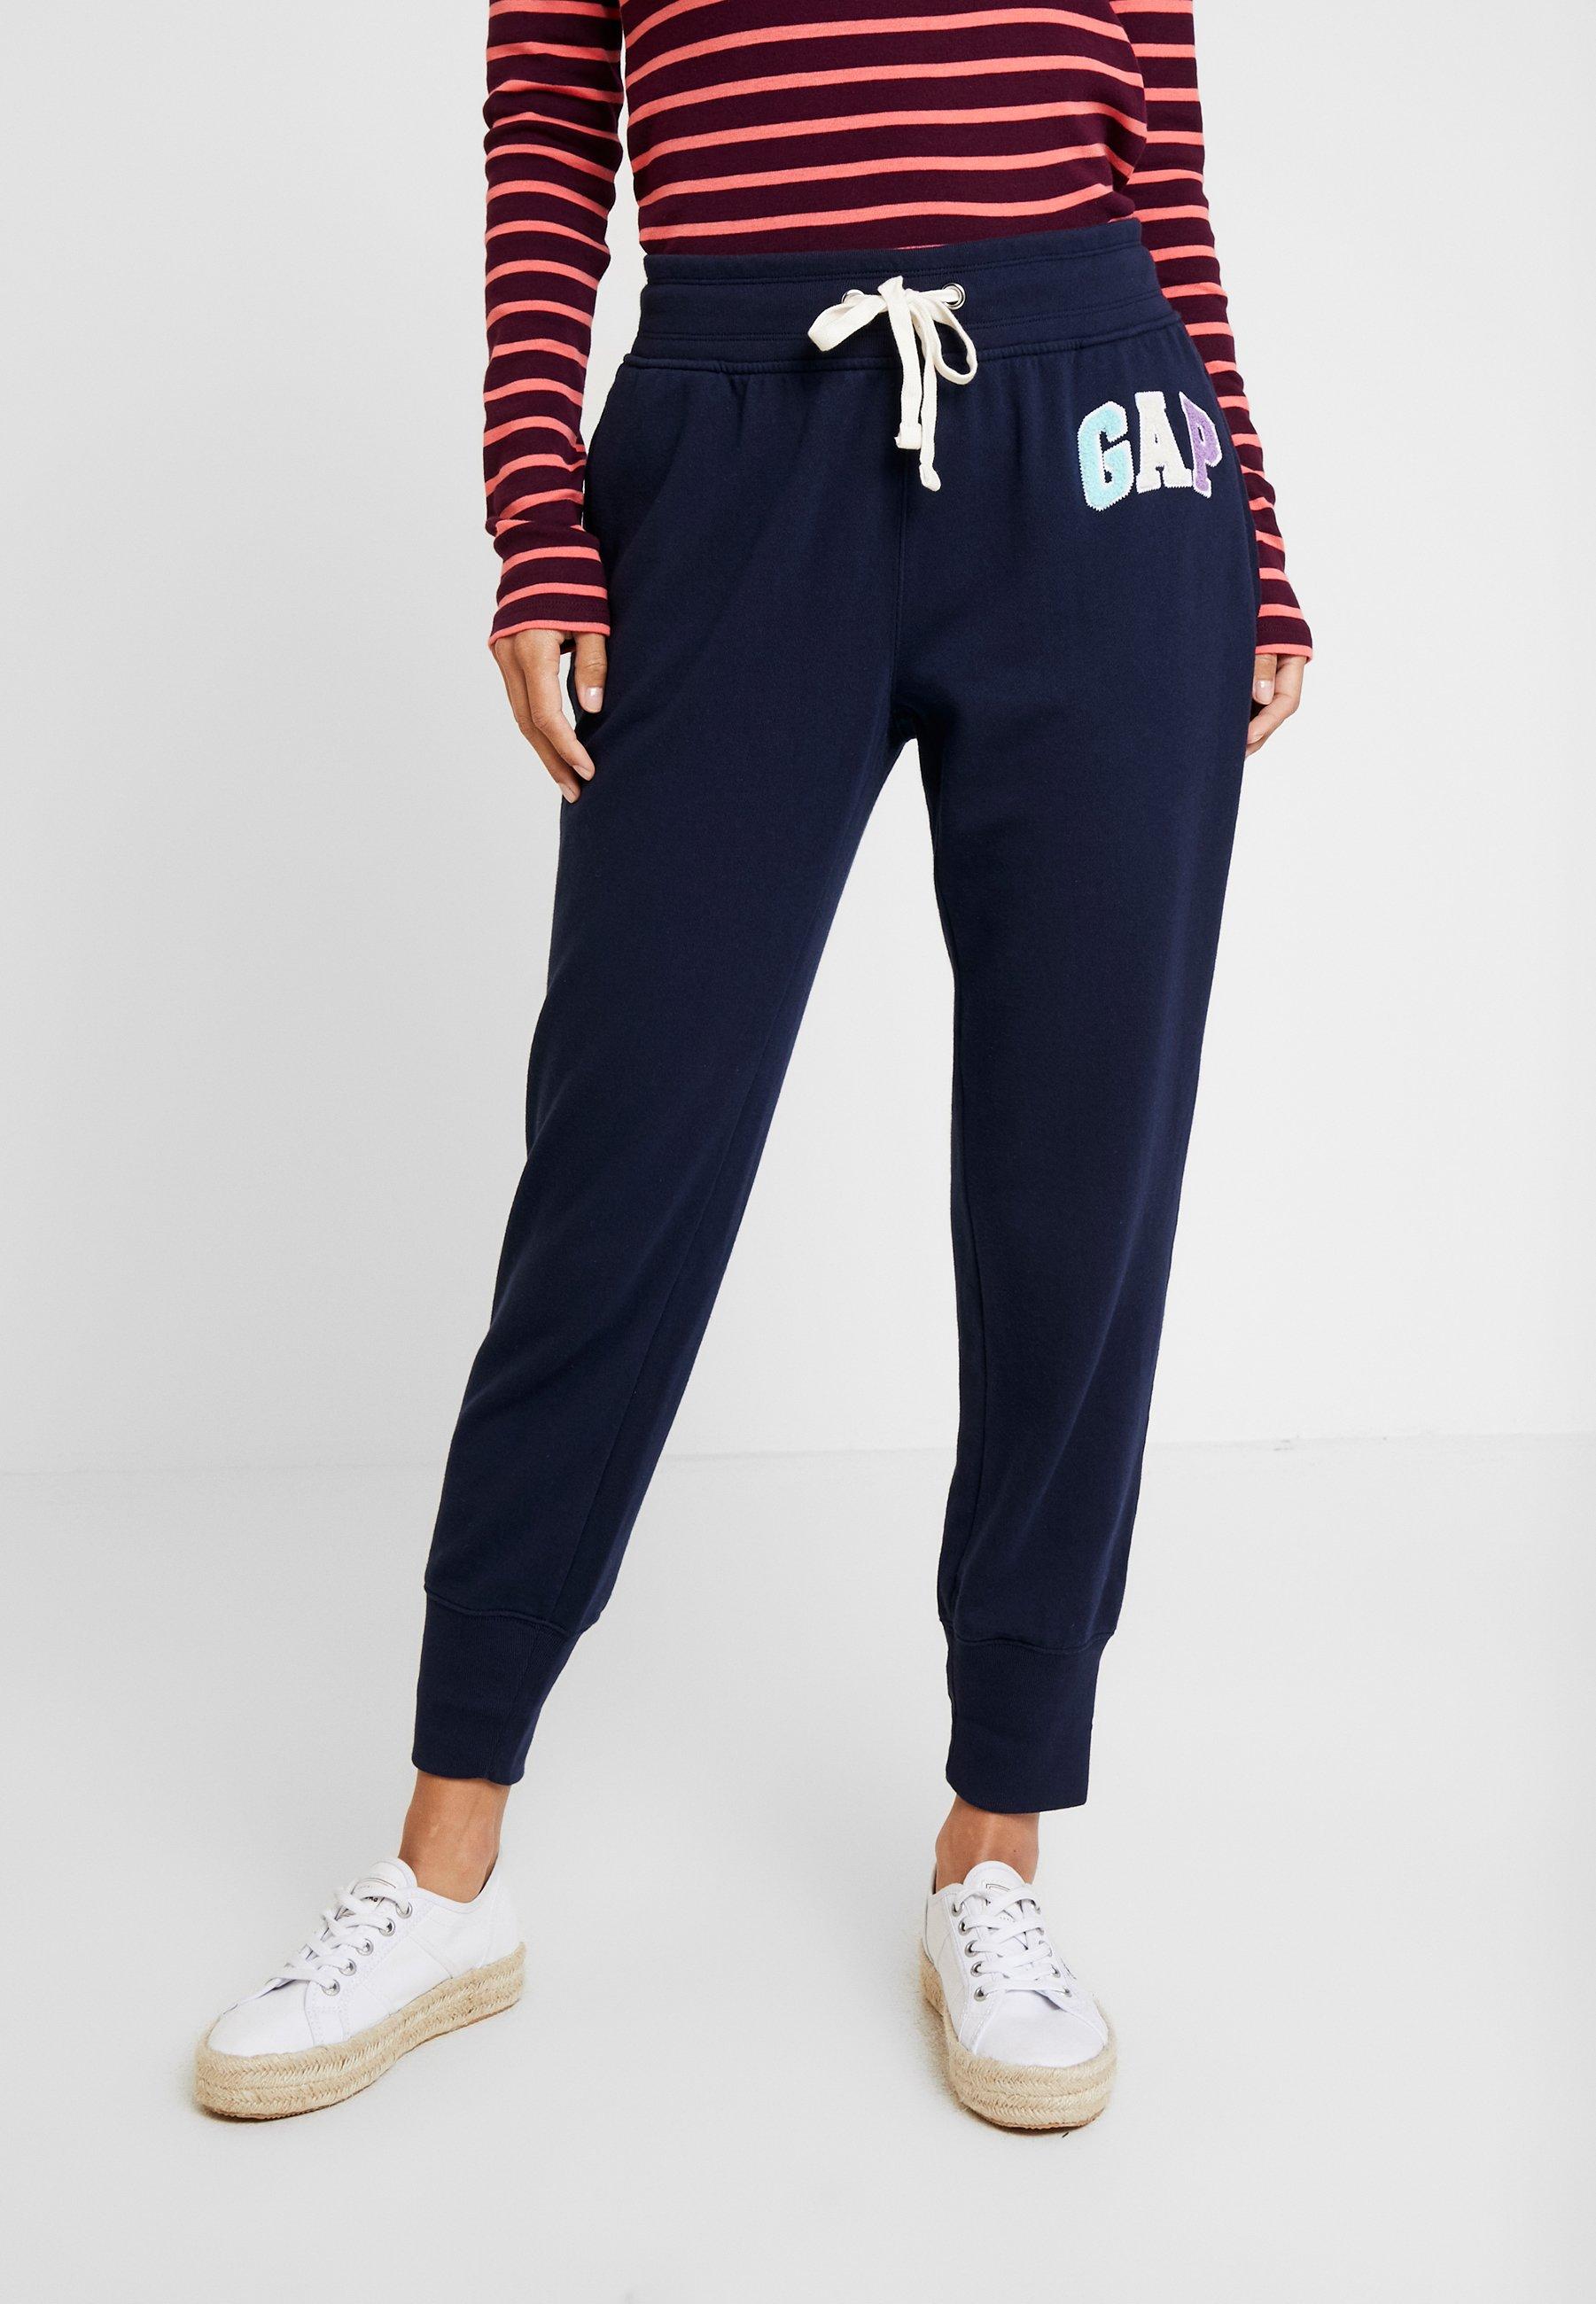 Gap Sportivi Gap Uniform Sportivi Navy Pantaloni Pantaloni Navy Uniform 76ygvIfmYb